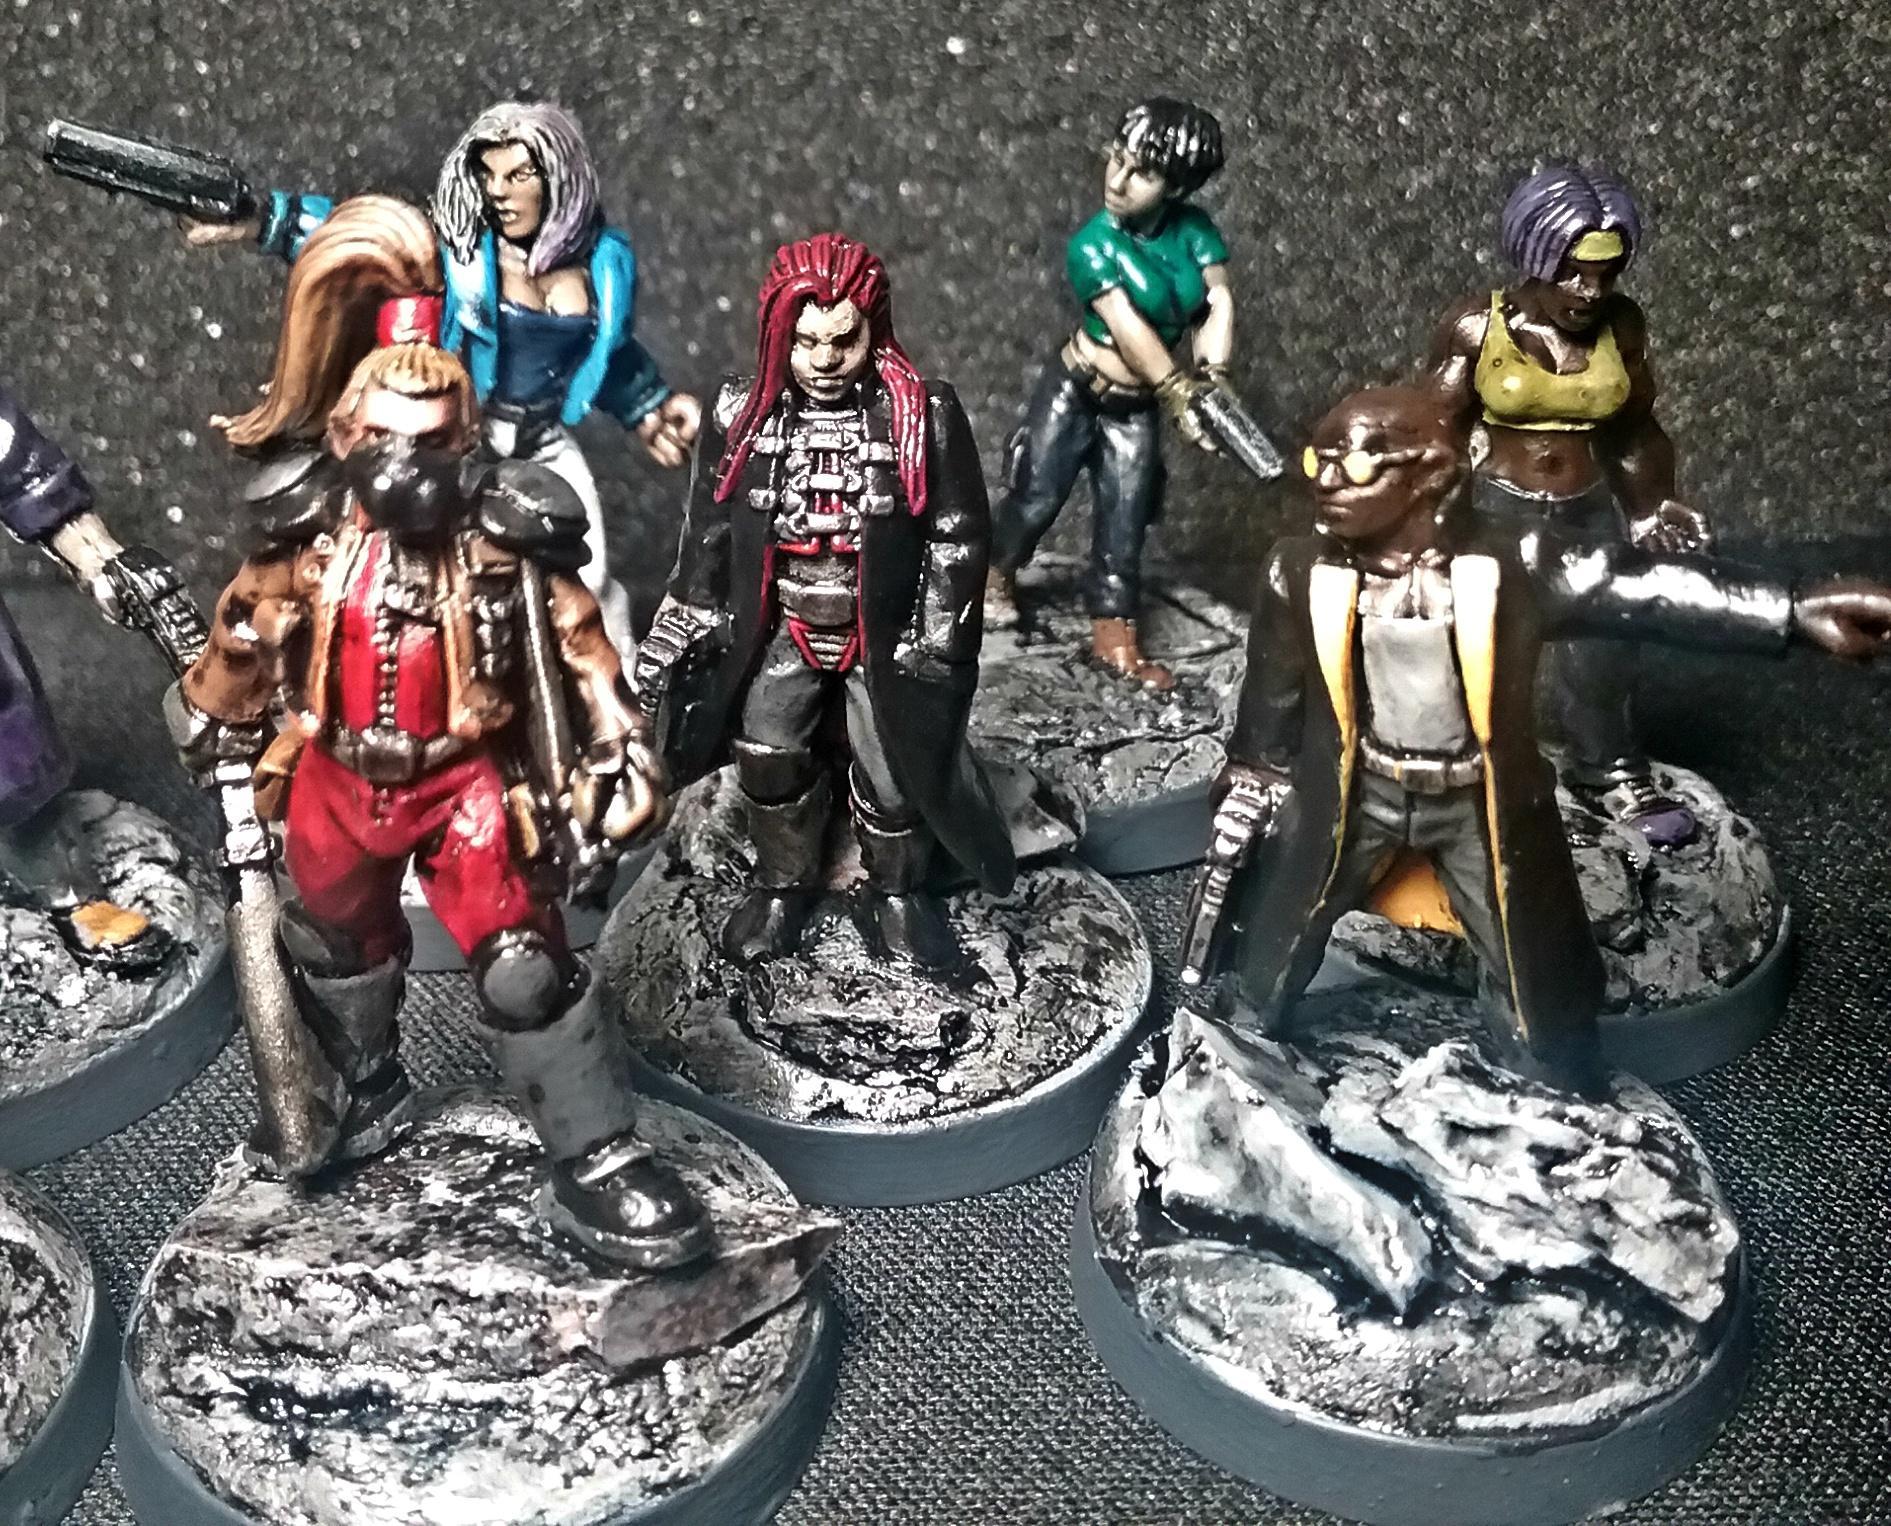 Militia, Rebels, Scotia Grendel, Scotia Grendel Militia, Urban Mammoth, Urban War, Void 1.1, Void War 1.1, Void Wars